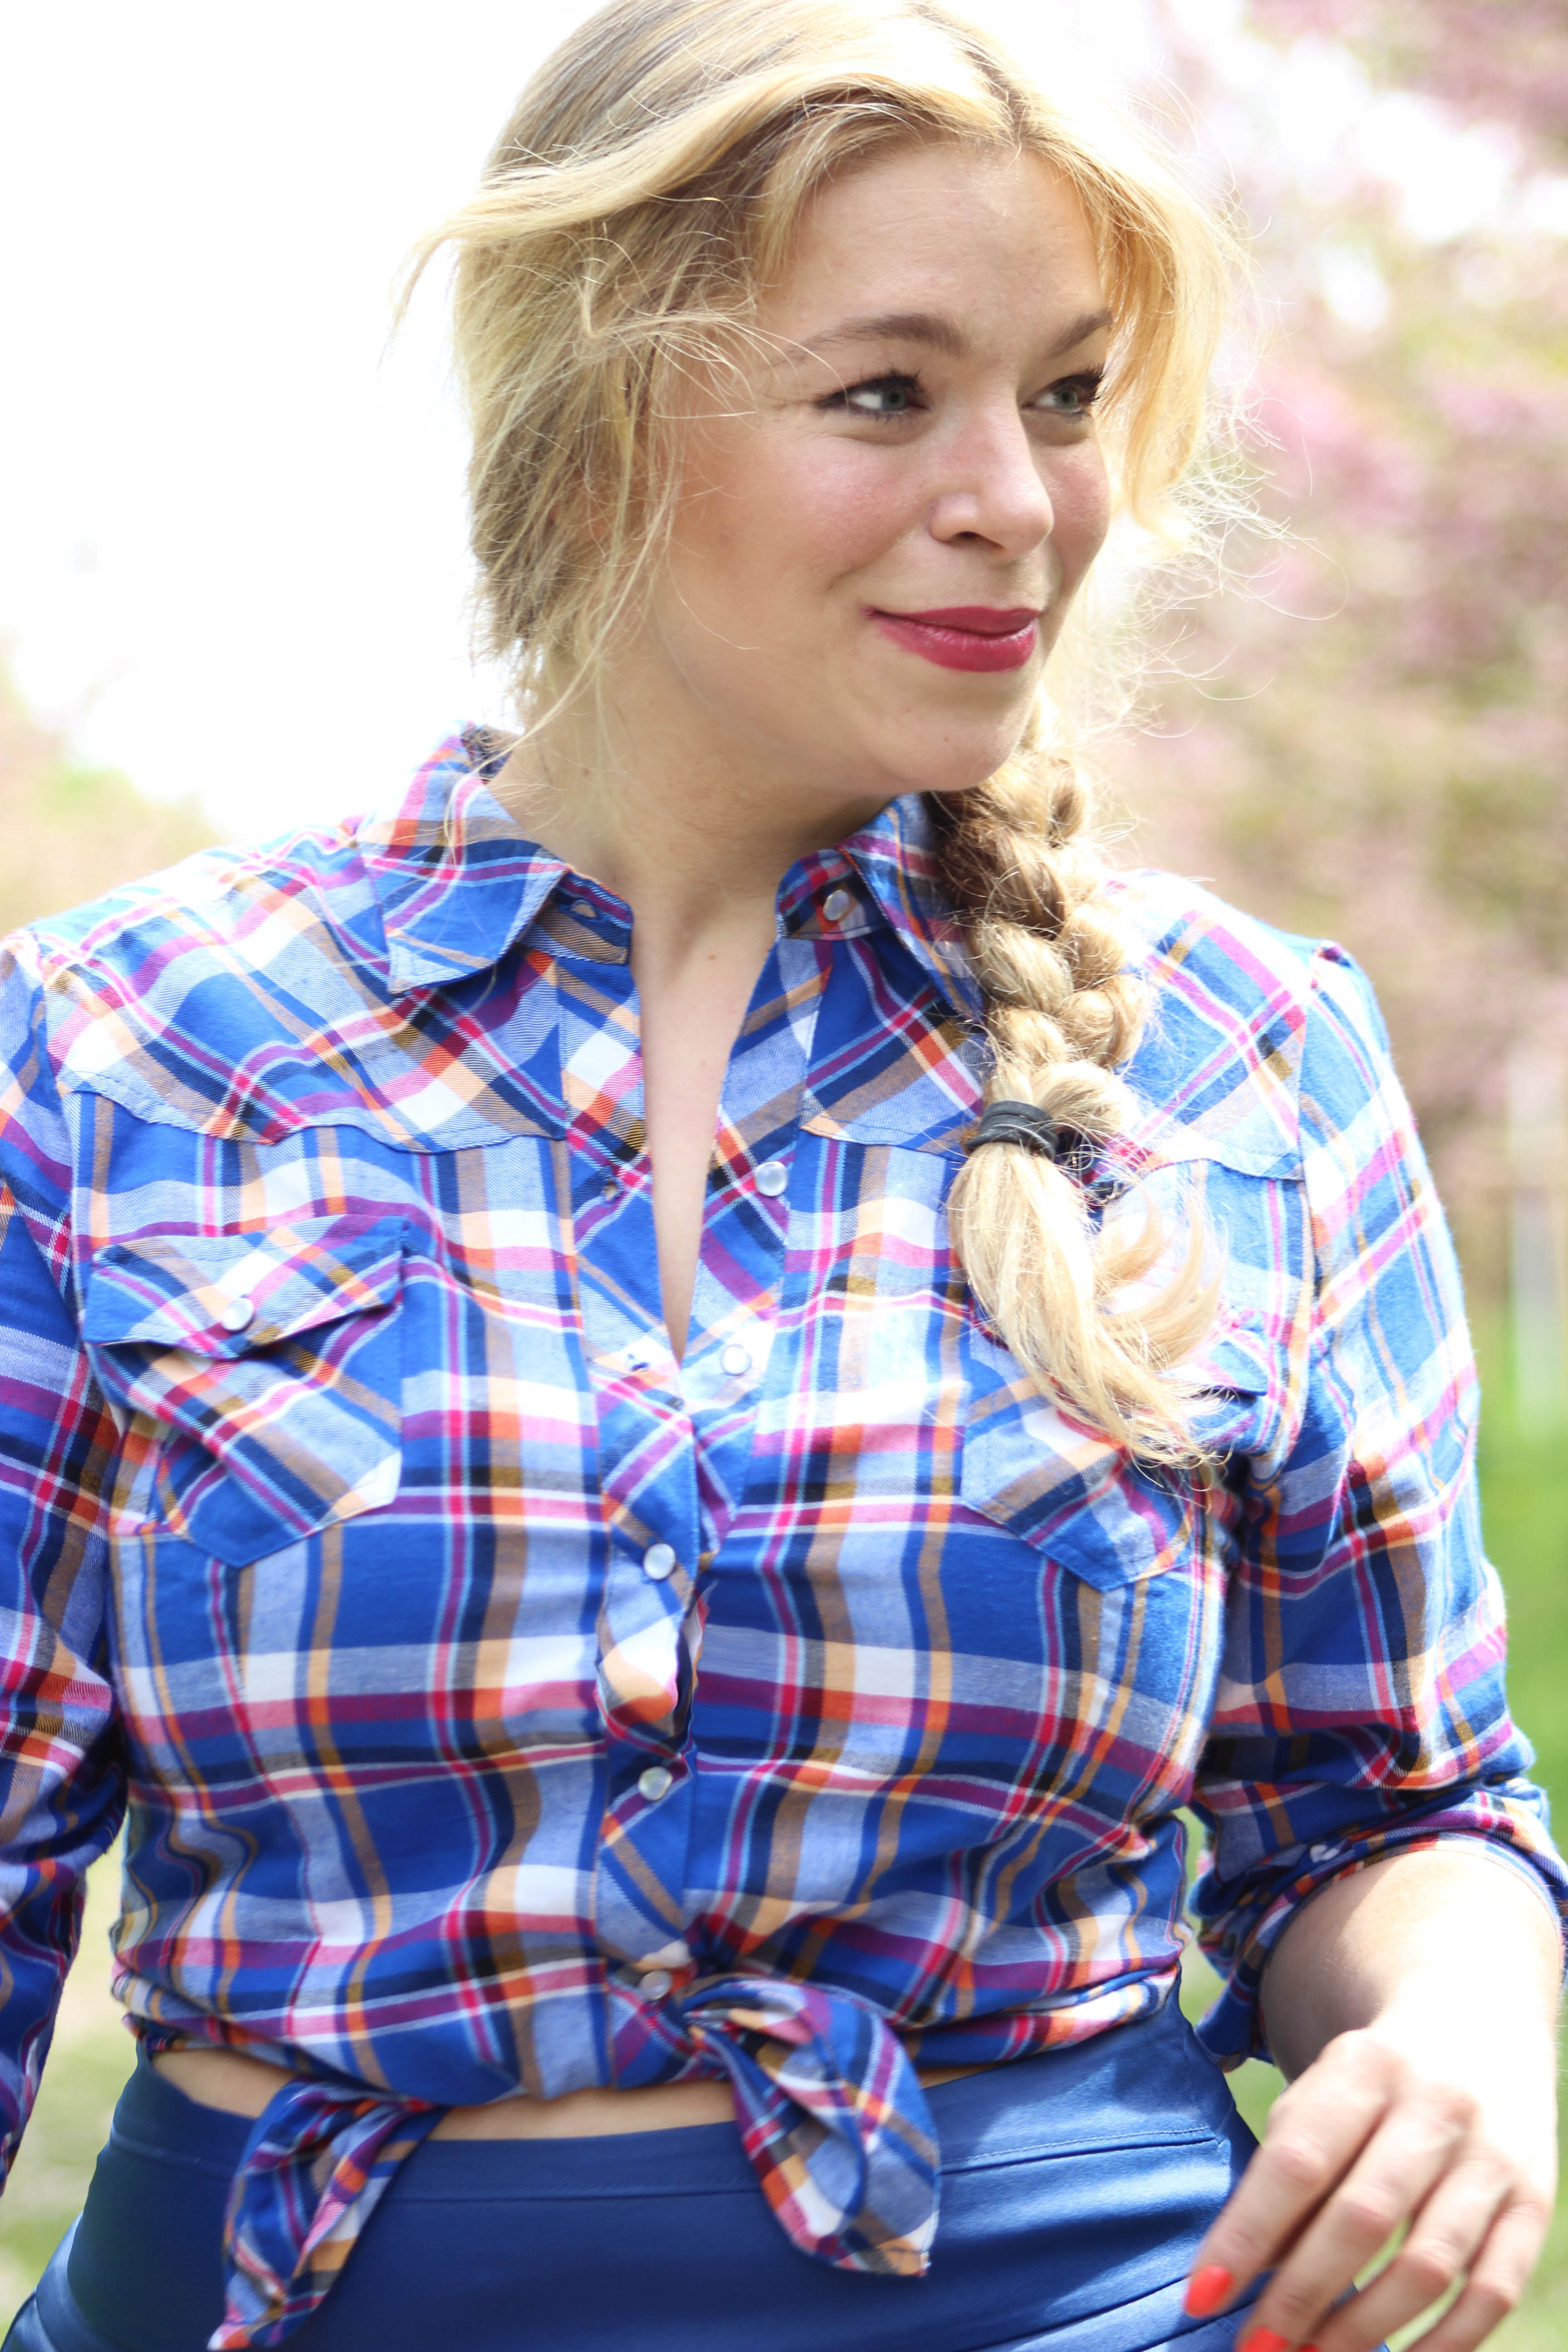 Courbesandco-Caterinapogorzelski-Megabambi-Plussizeblogger-curvyoutfit